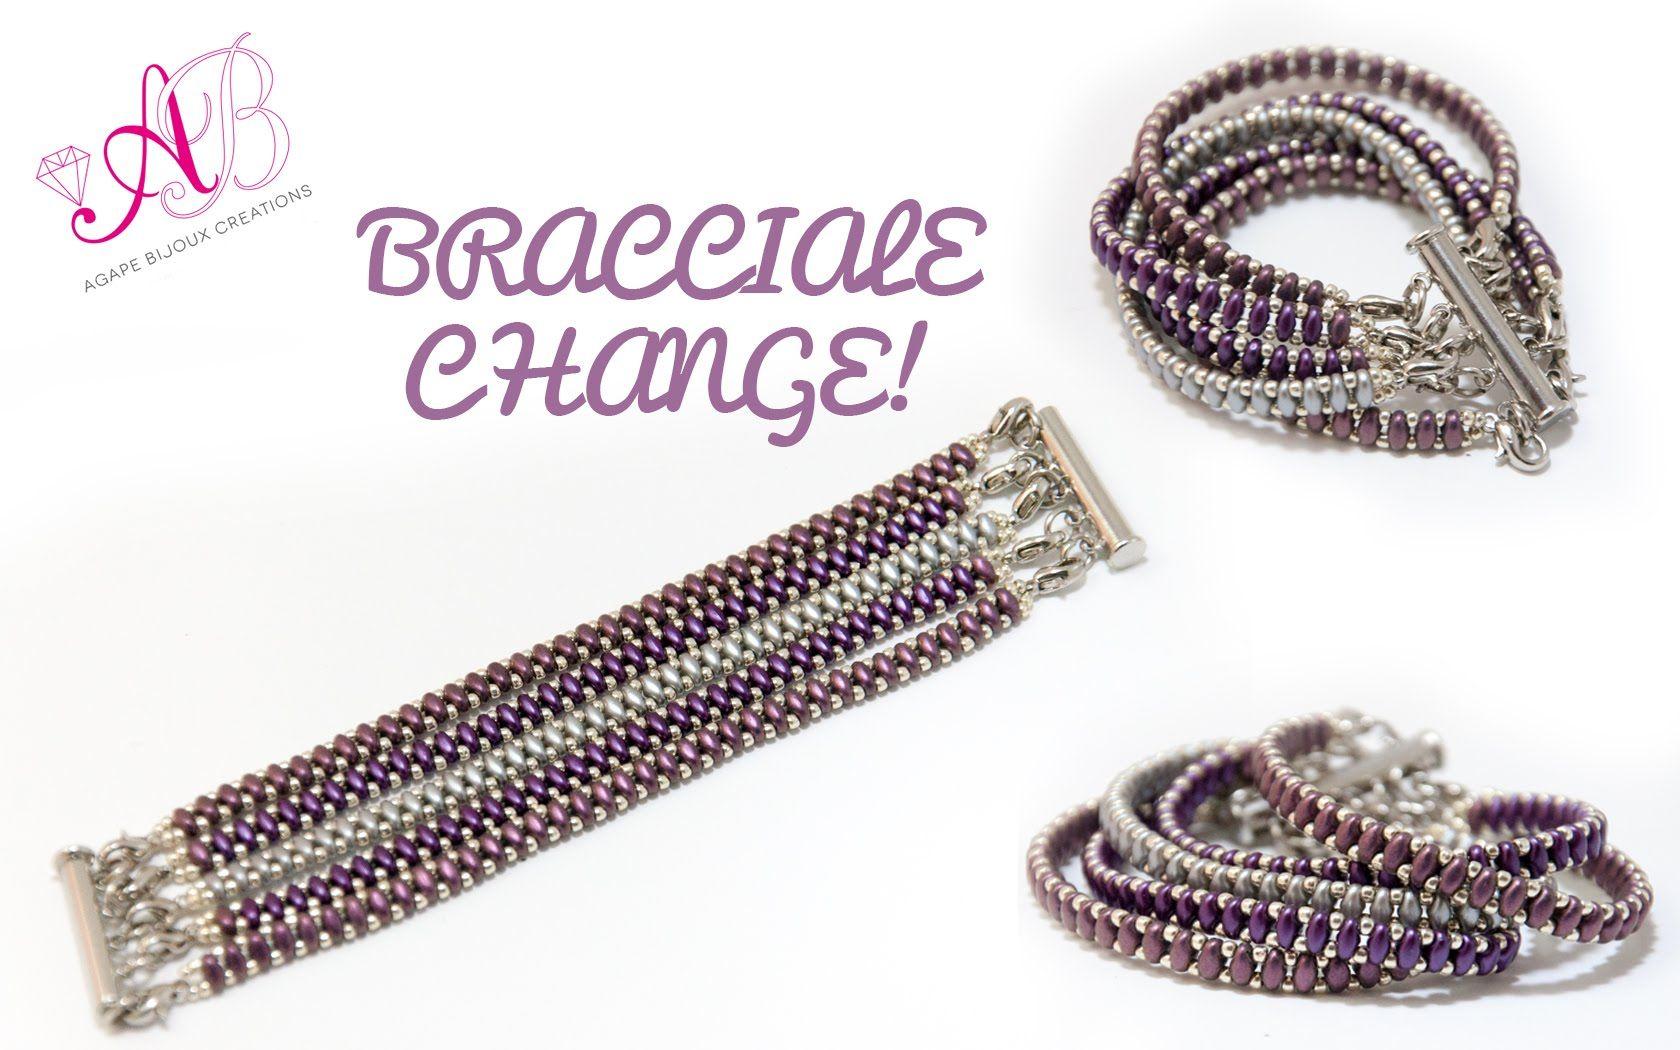 Italian language based bracelet tutorial